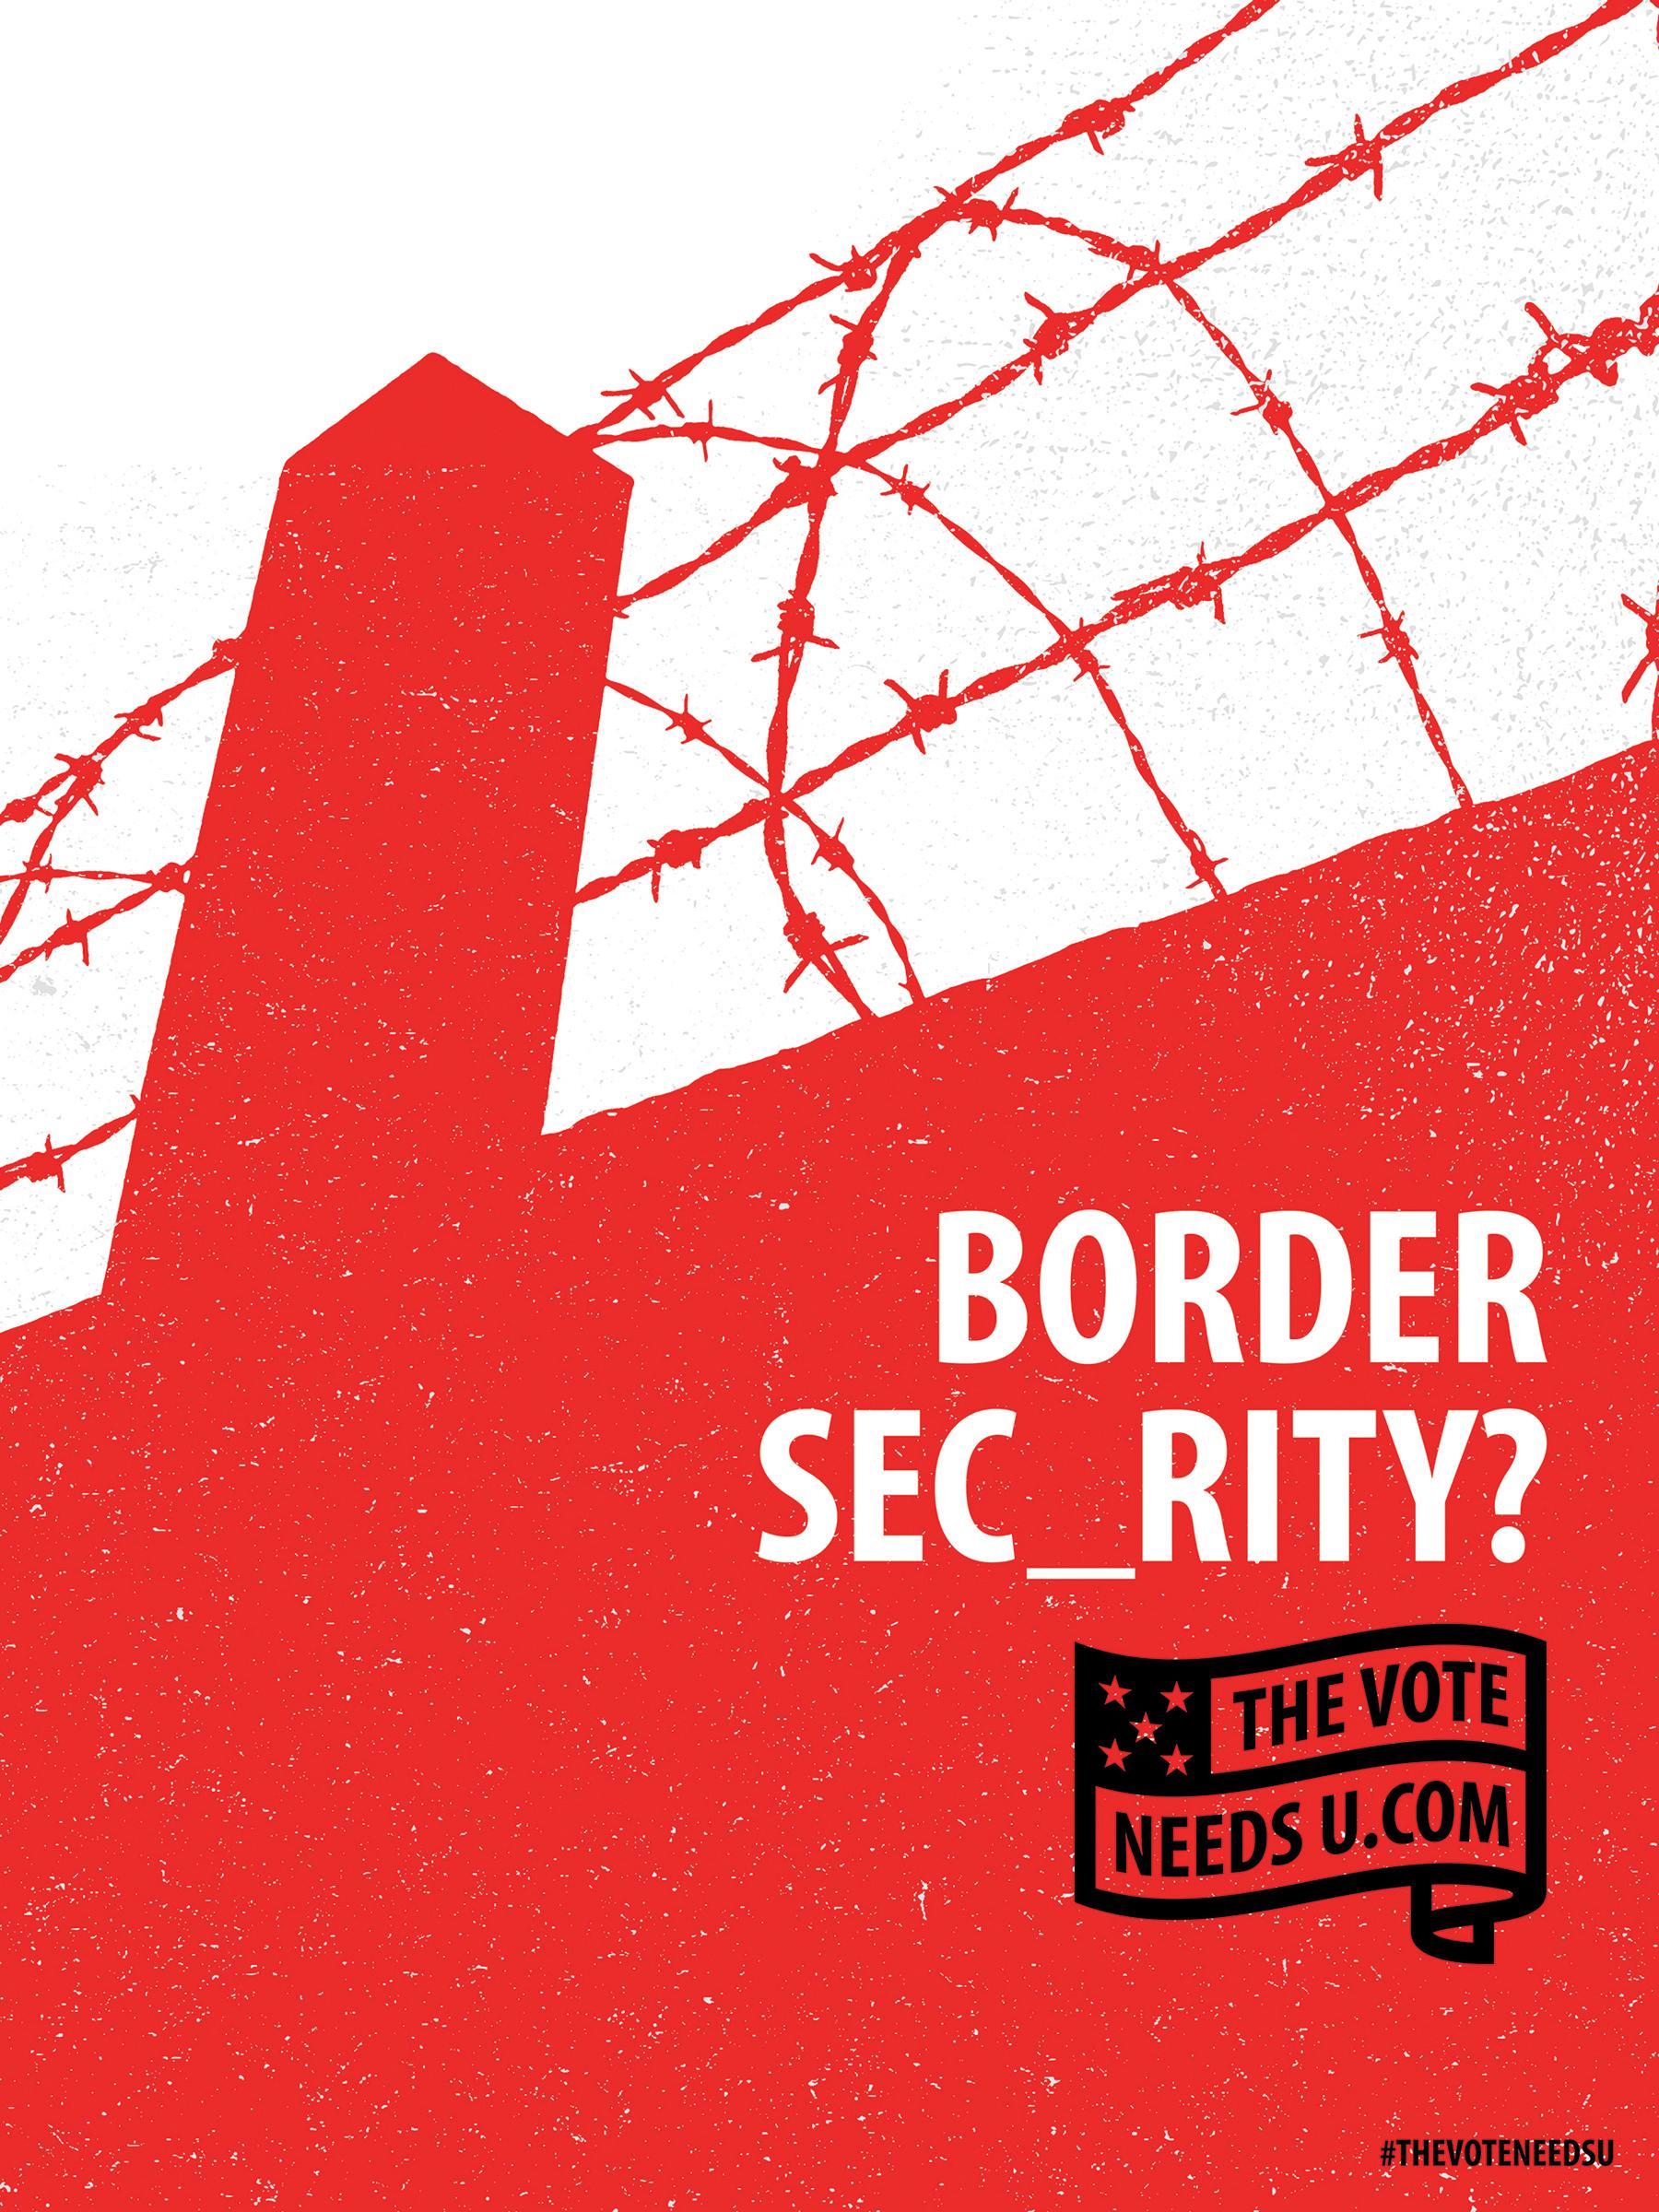 25.Thevoteneedsu Posters Bordersecurity Aotw 0.[大嘴收纳屋].jpg